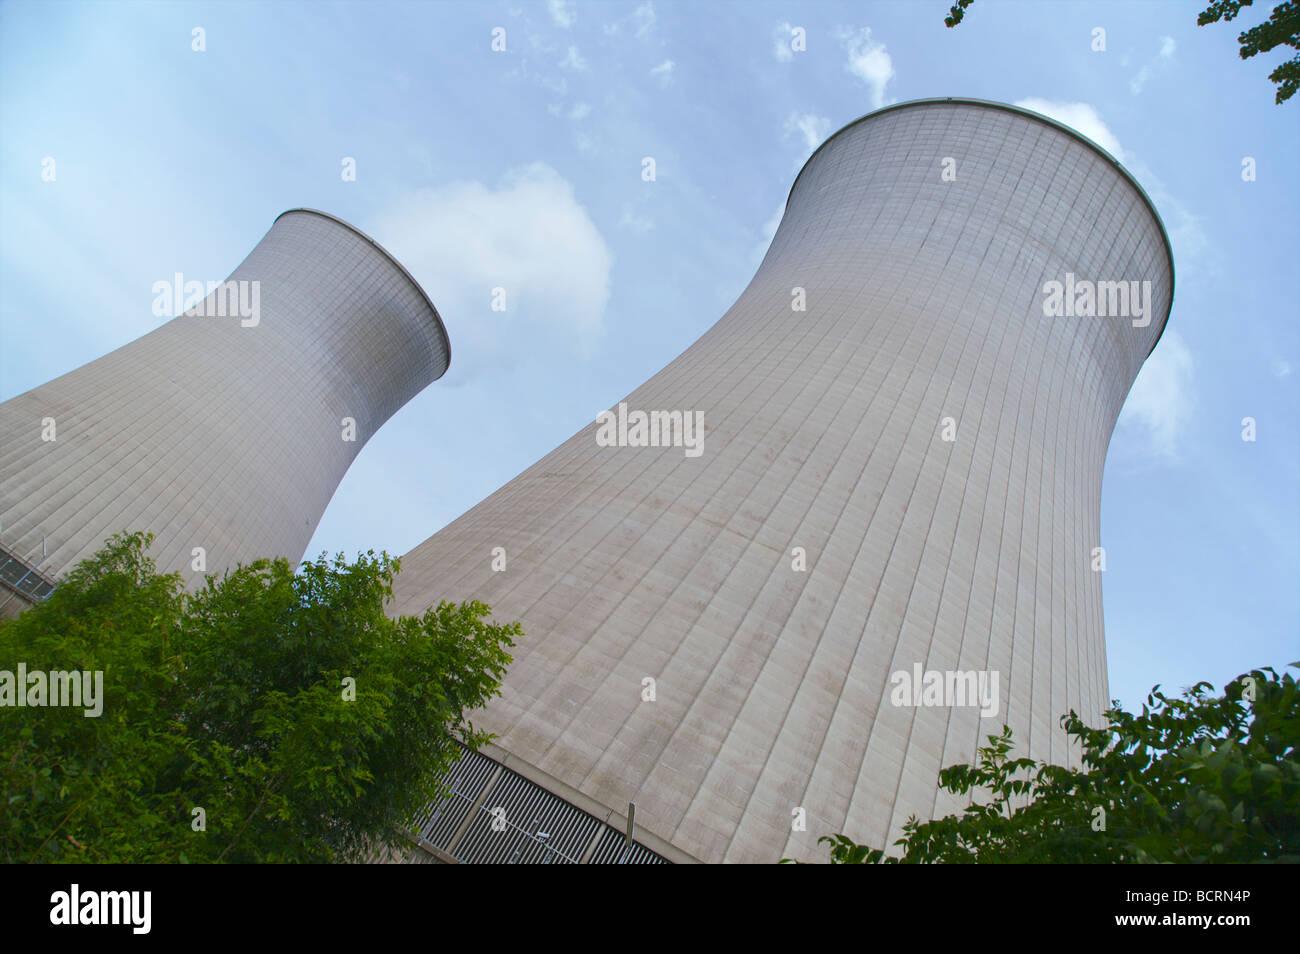 Cooling towers of the Gundremmingen nuclear power plant in Bavaria, Germany. Kühltürme Kernkraftwerk Gundremmingen. - Stock Image